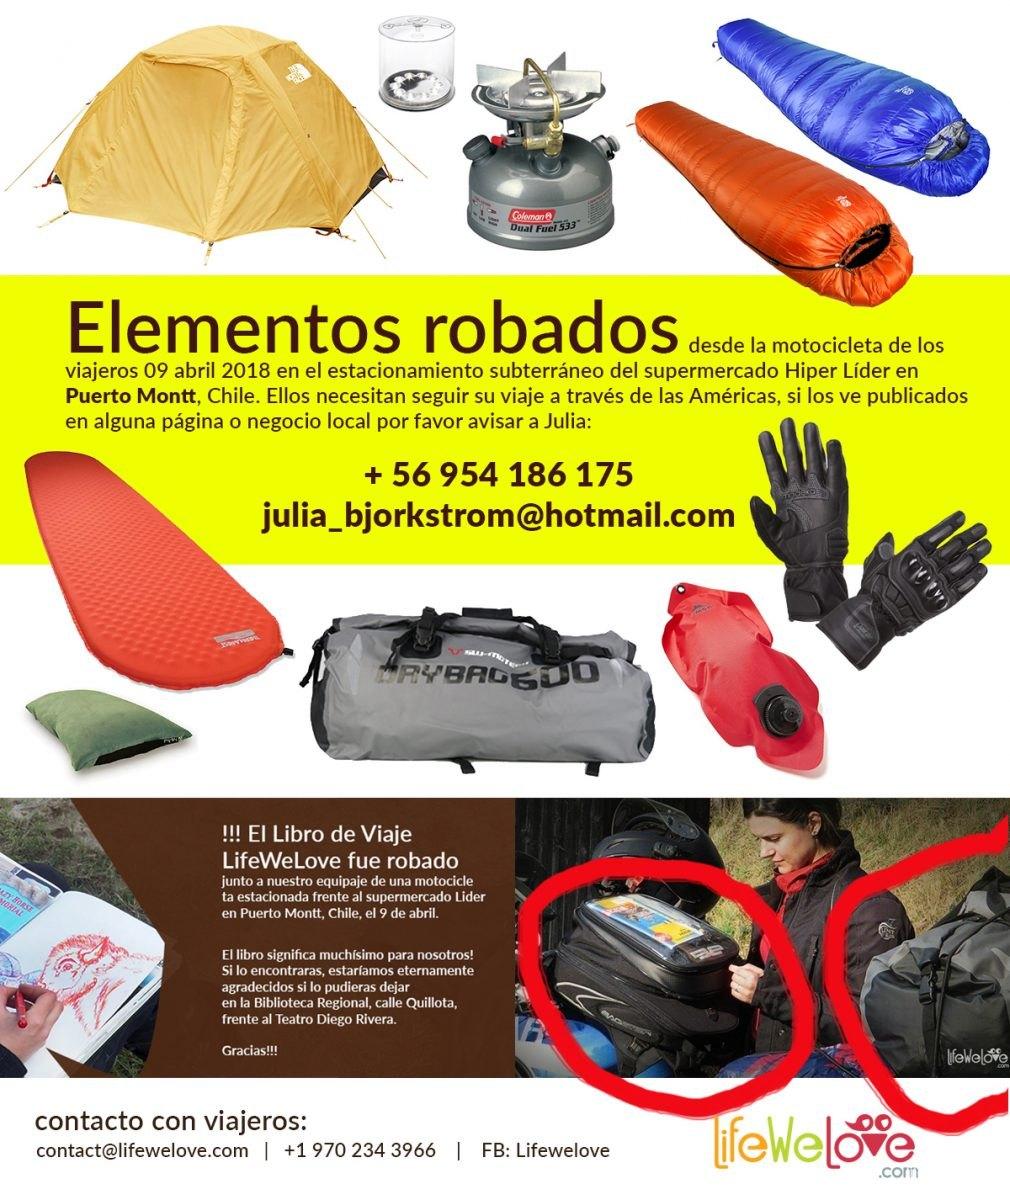 Elementos Rabados - Stolen Items